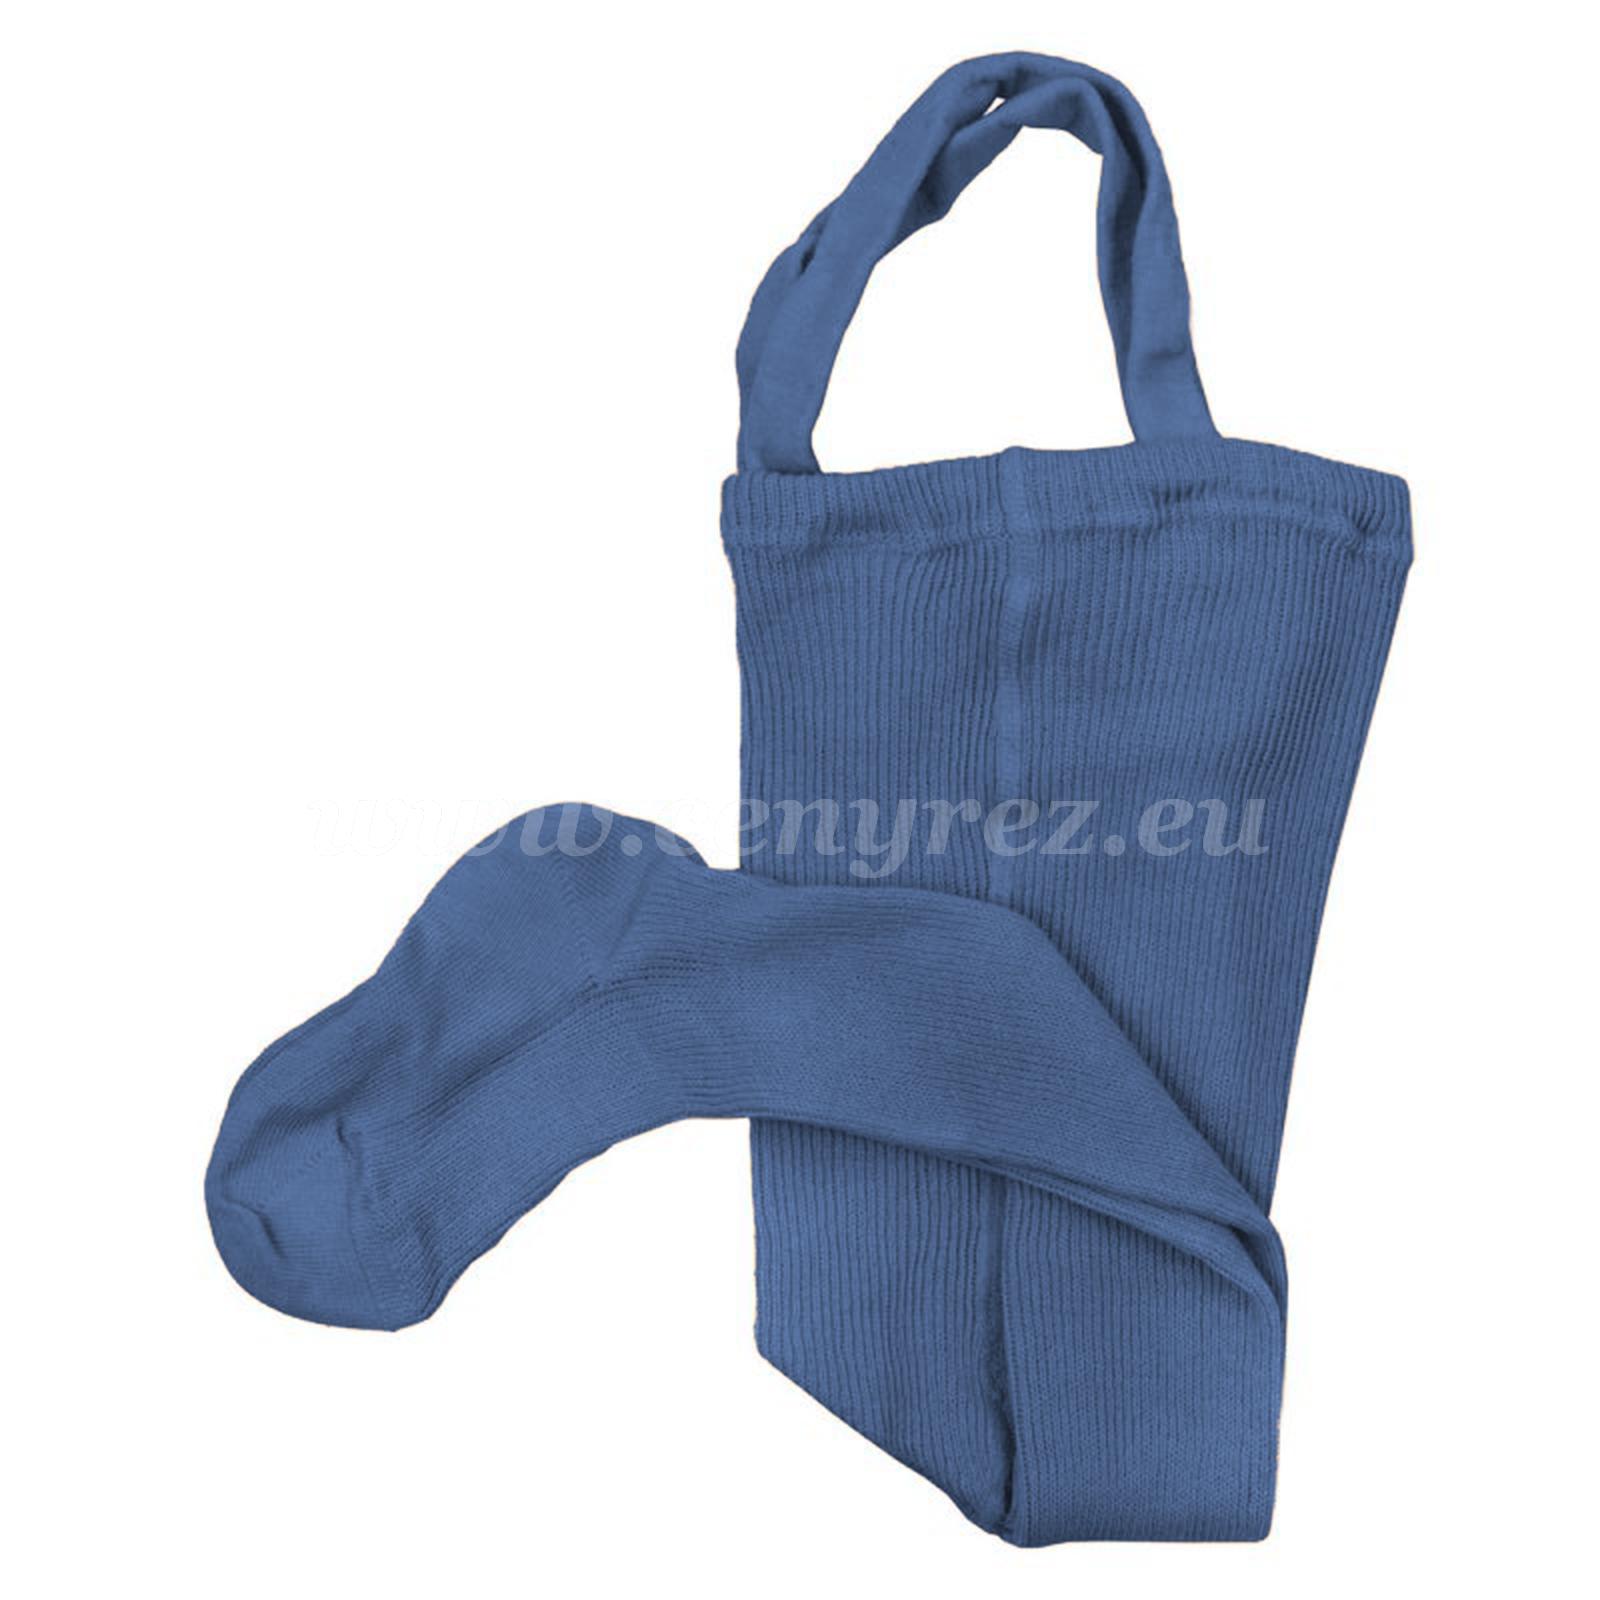 DUCIKA pančucháče s trakmi - modrá